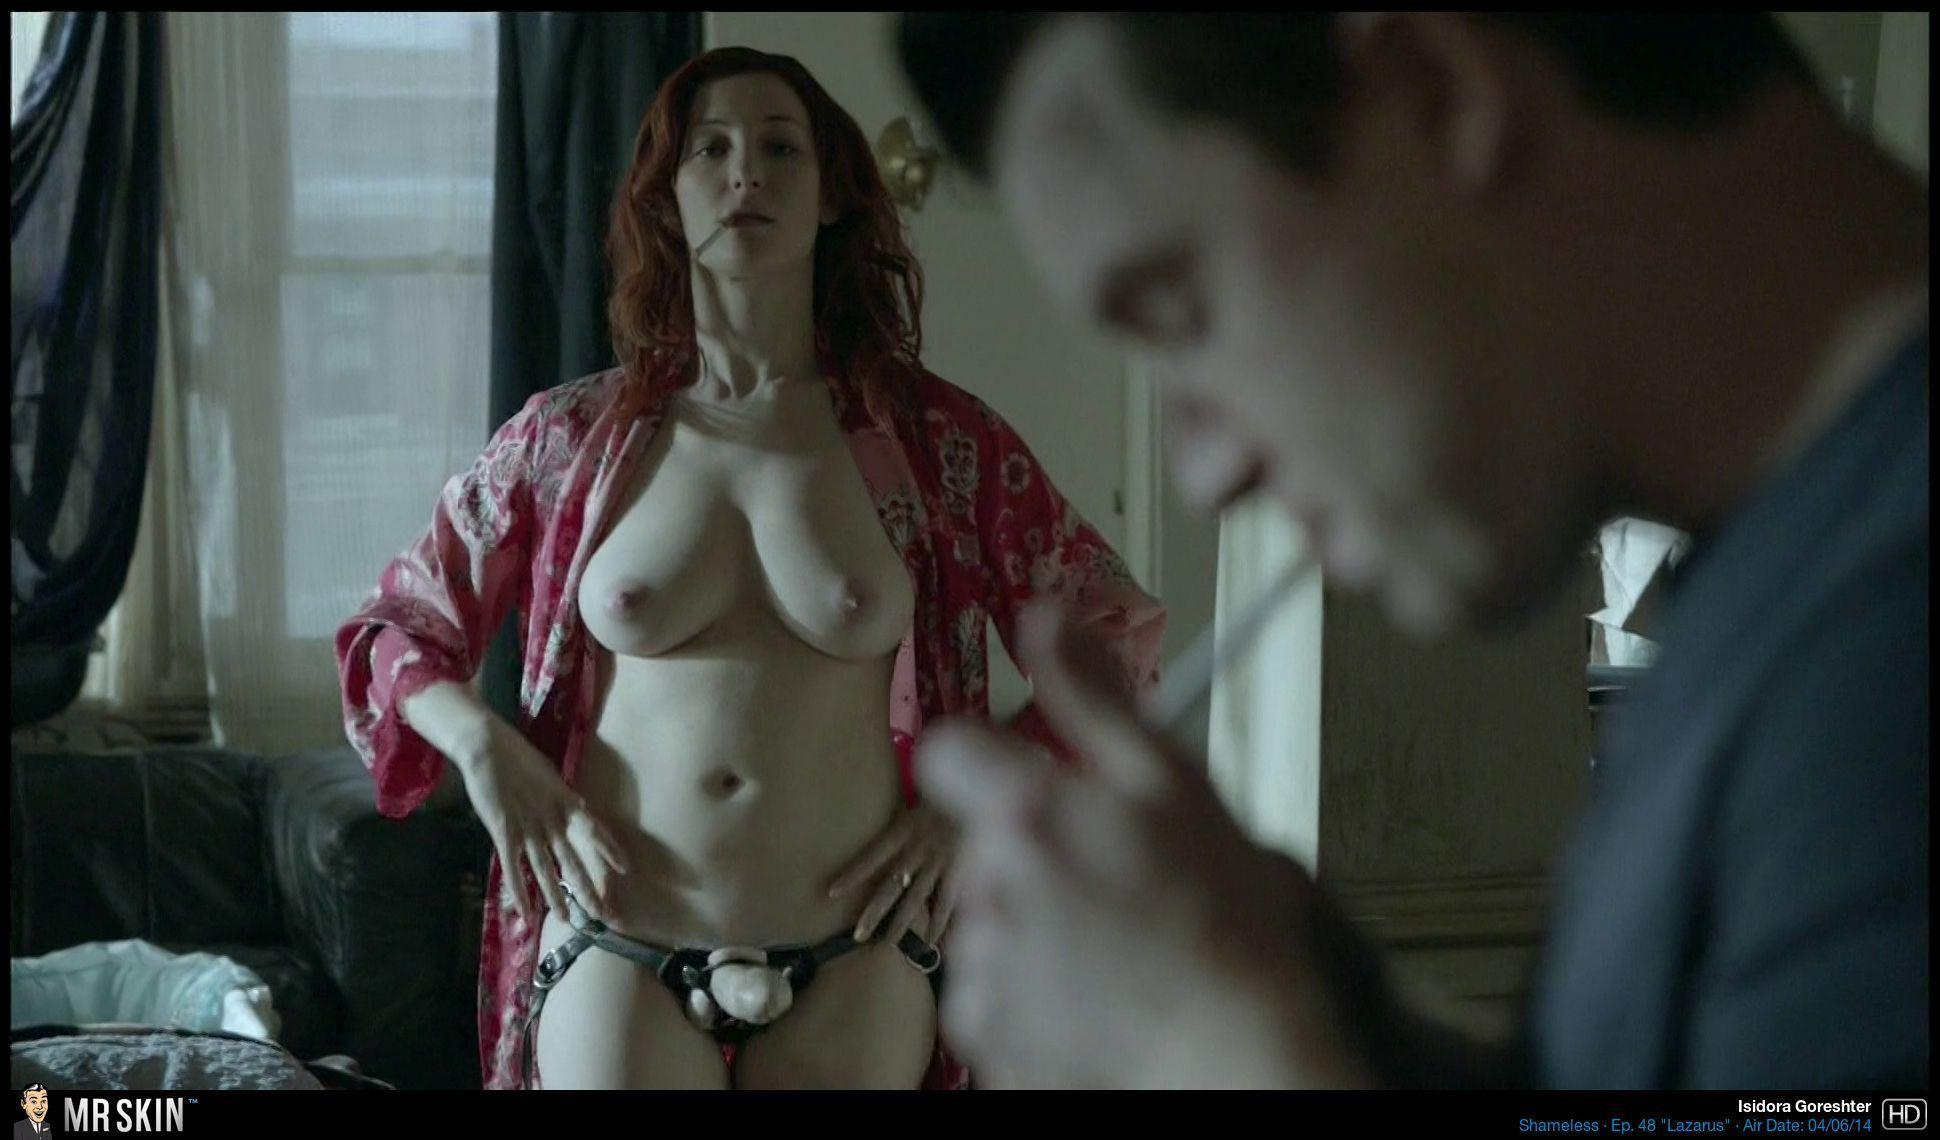 Vikings tv show nude scene